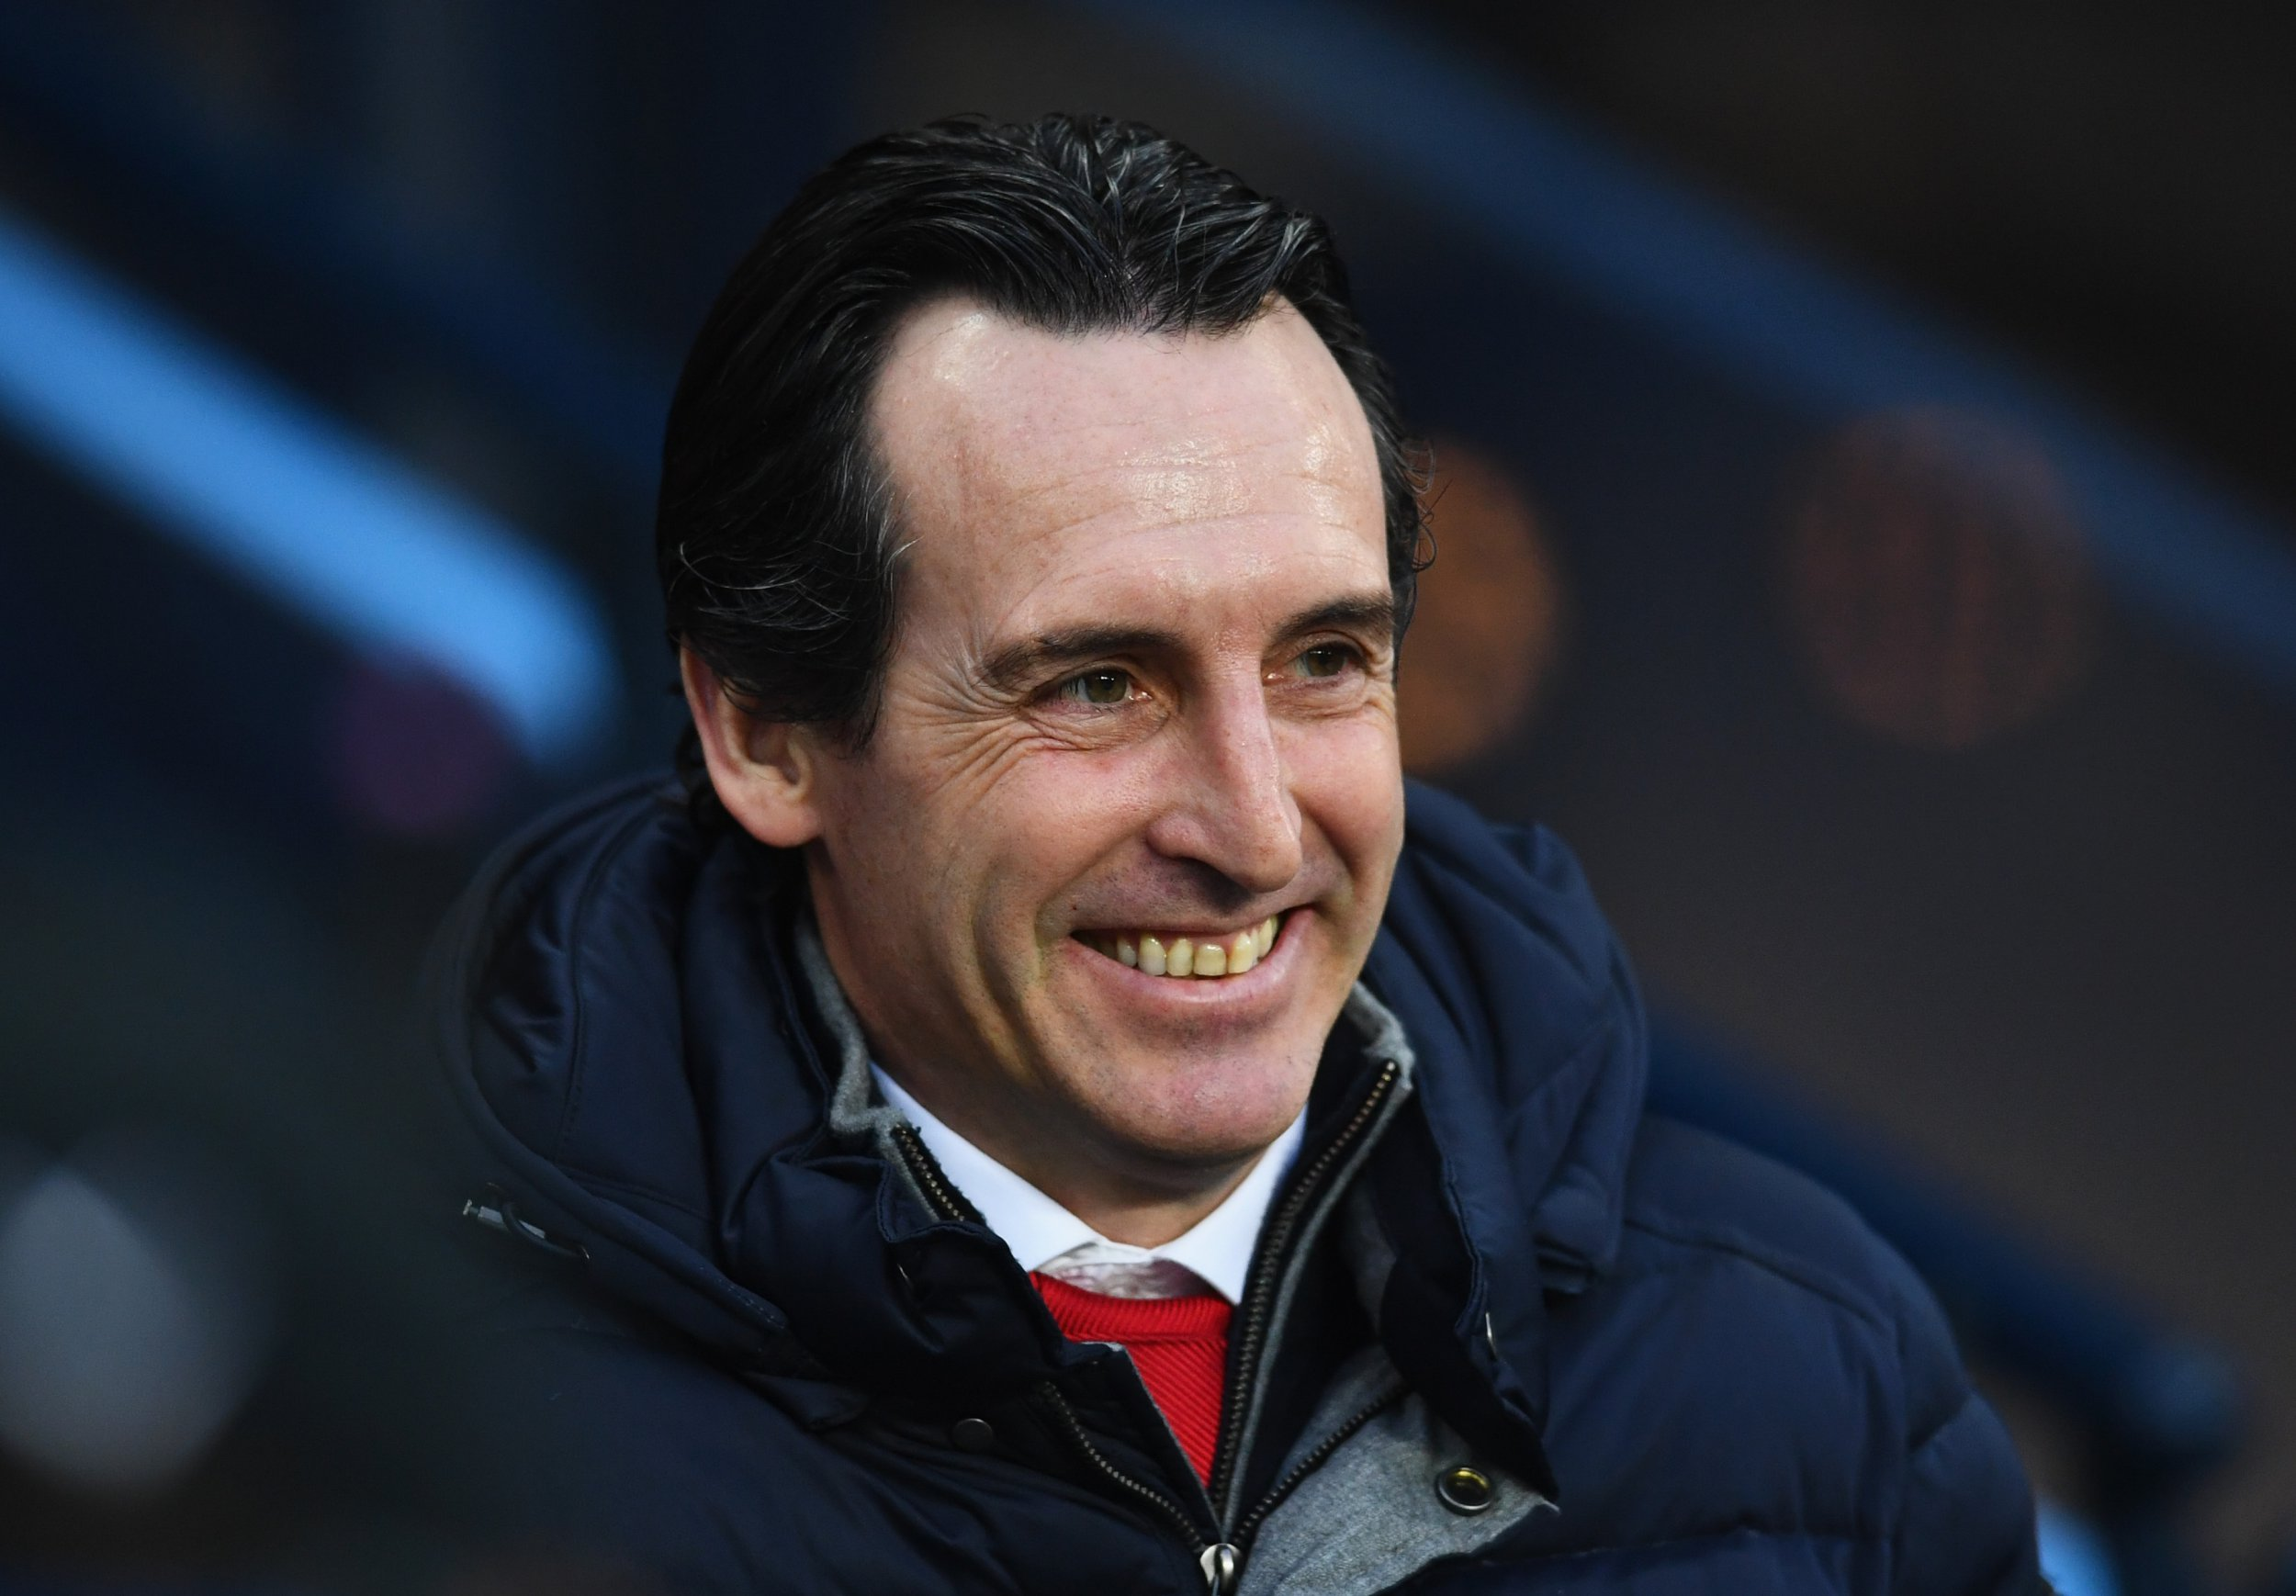 Santi Cazorla rates Unai Emery's first season at Arsenal